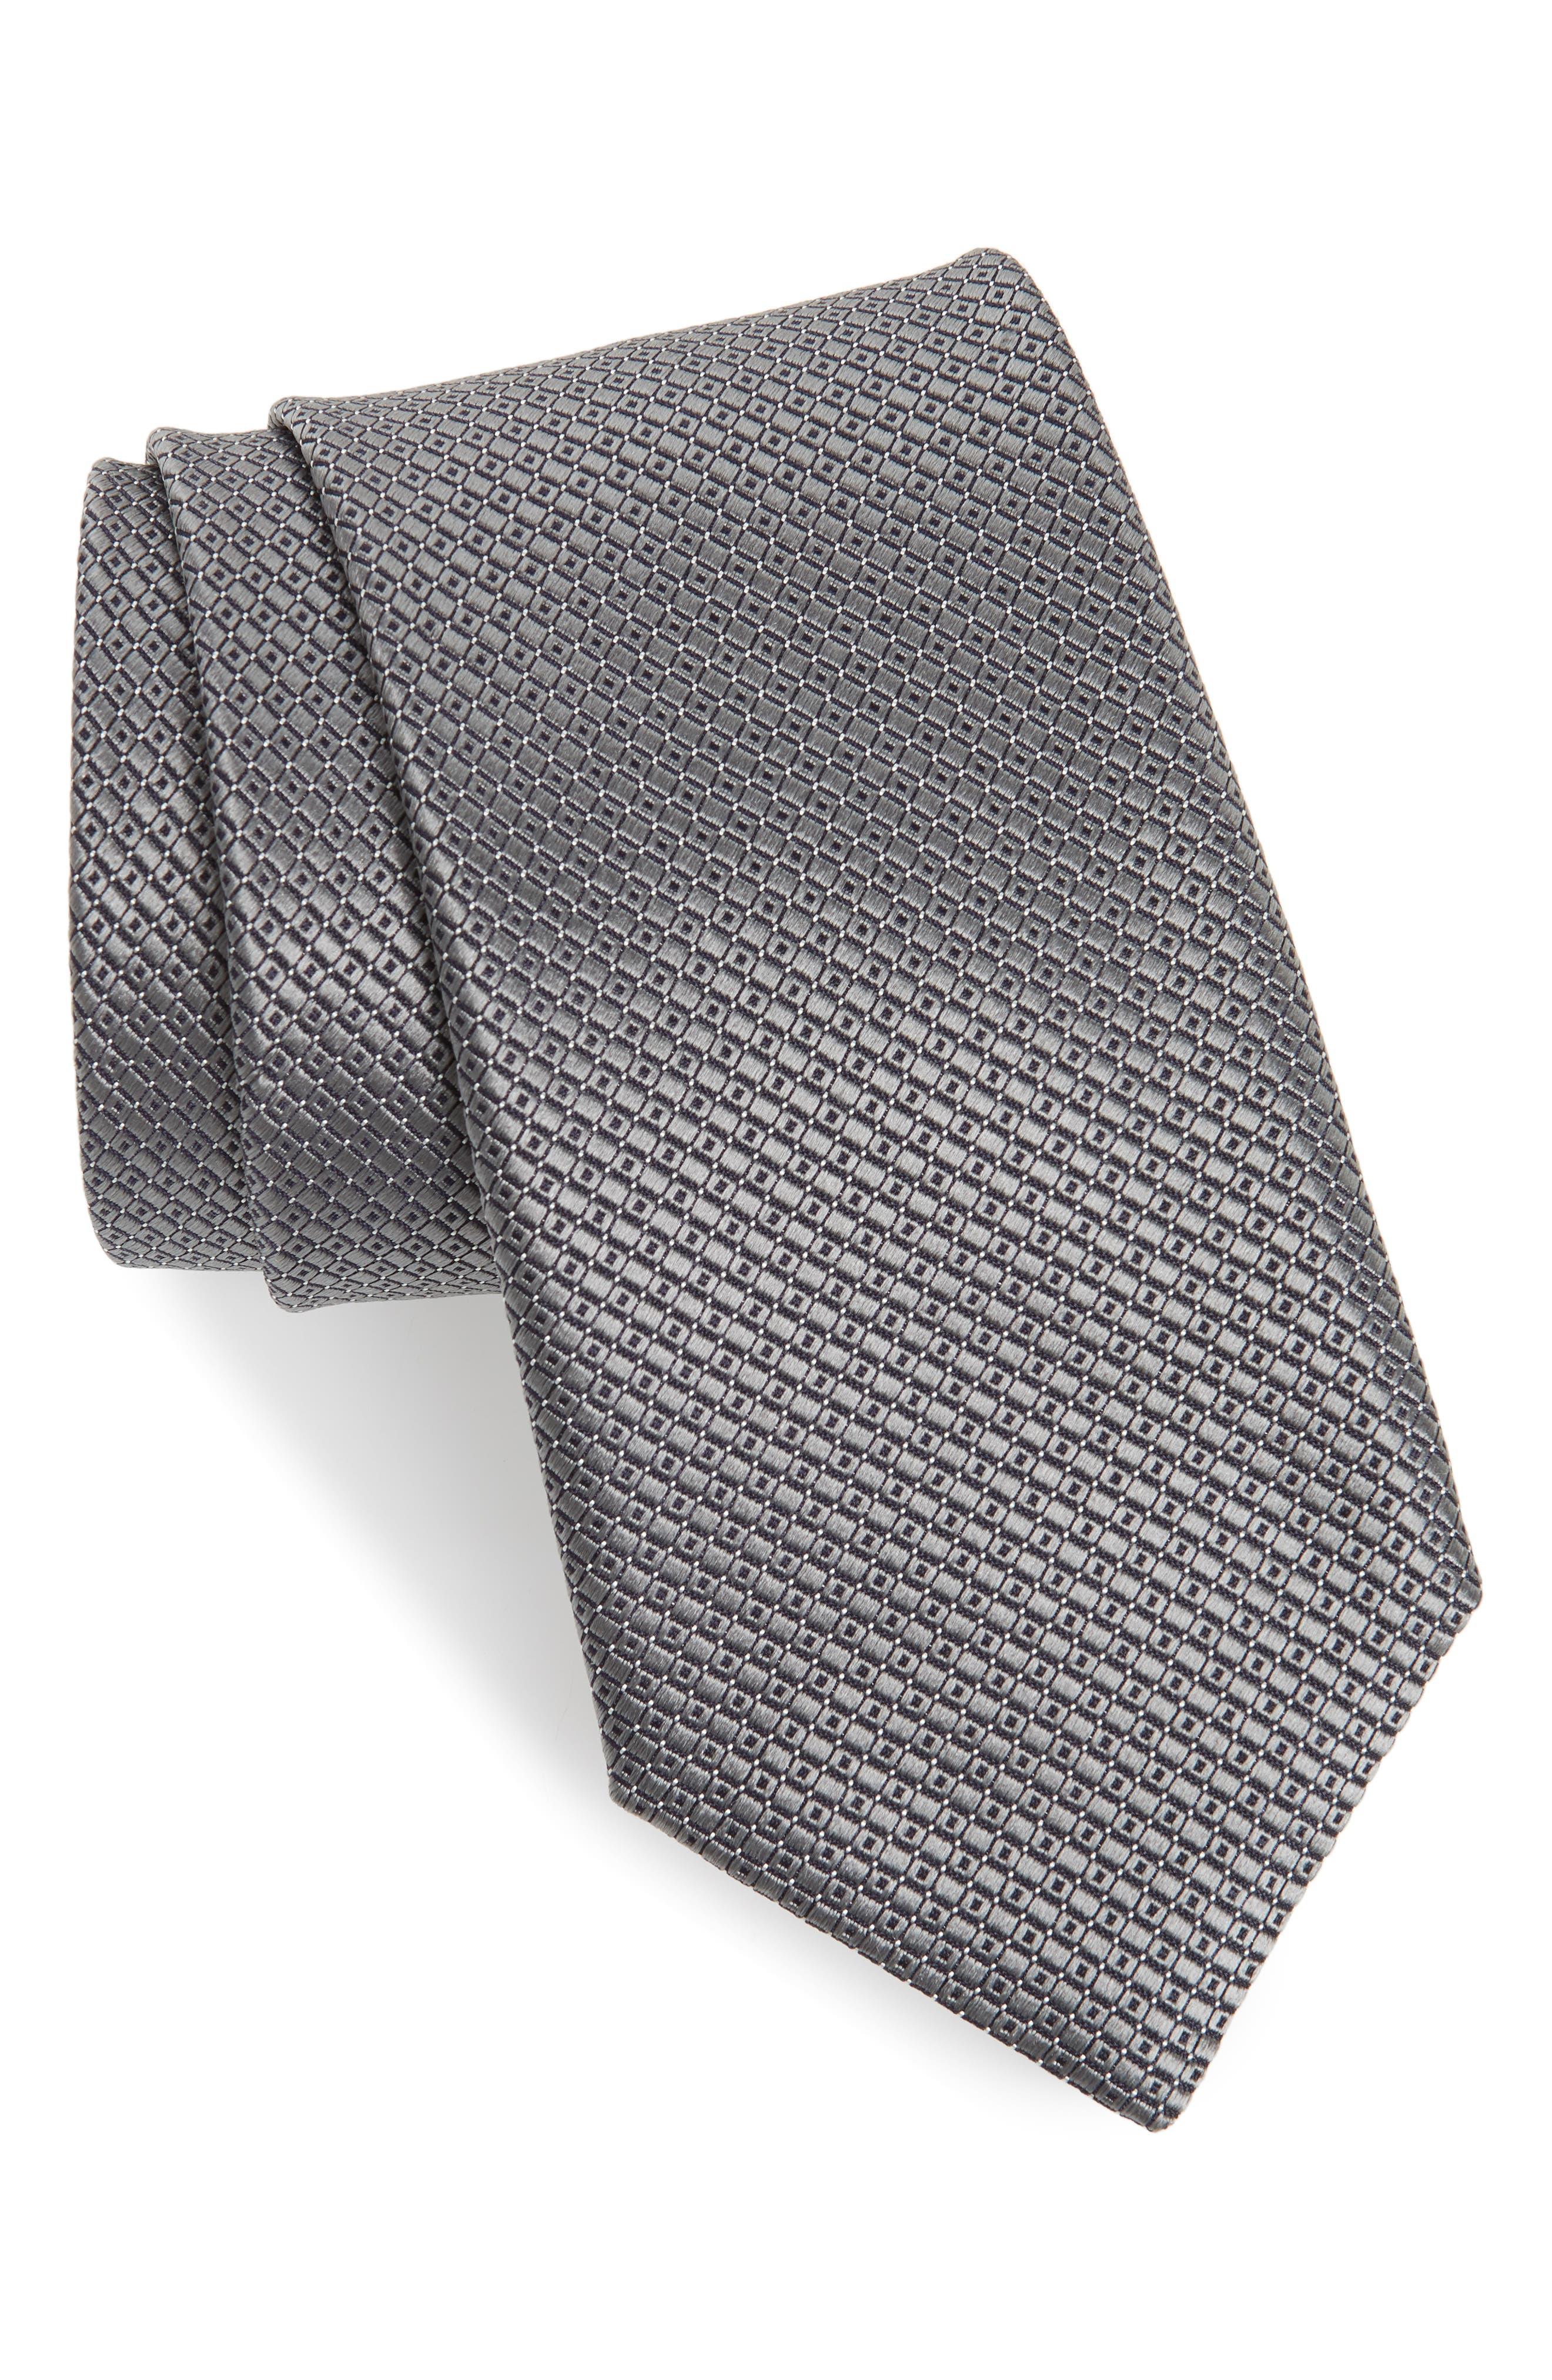 CANALI, Geometric Silk Tie, Main thumbnail 1, color, SILVER